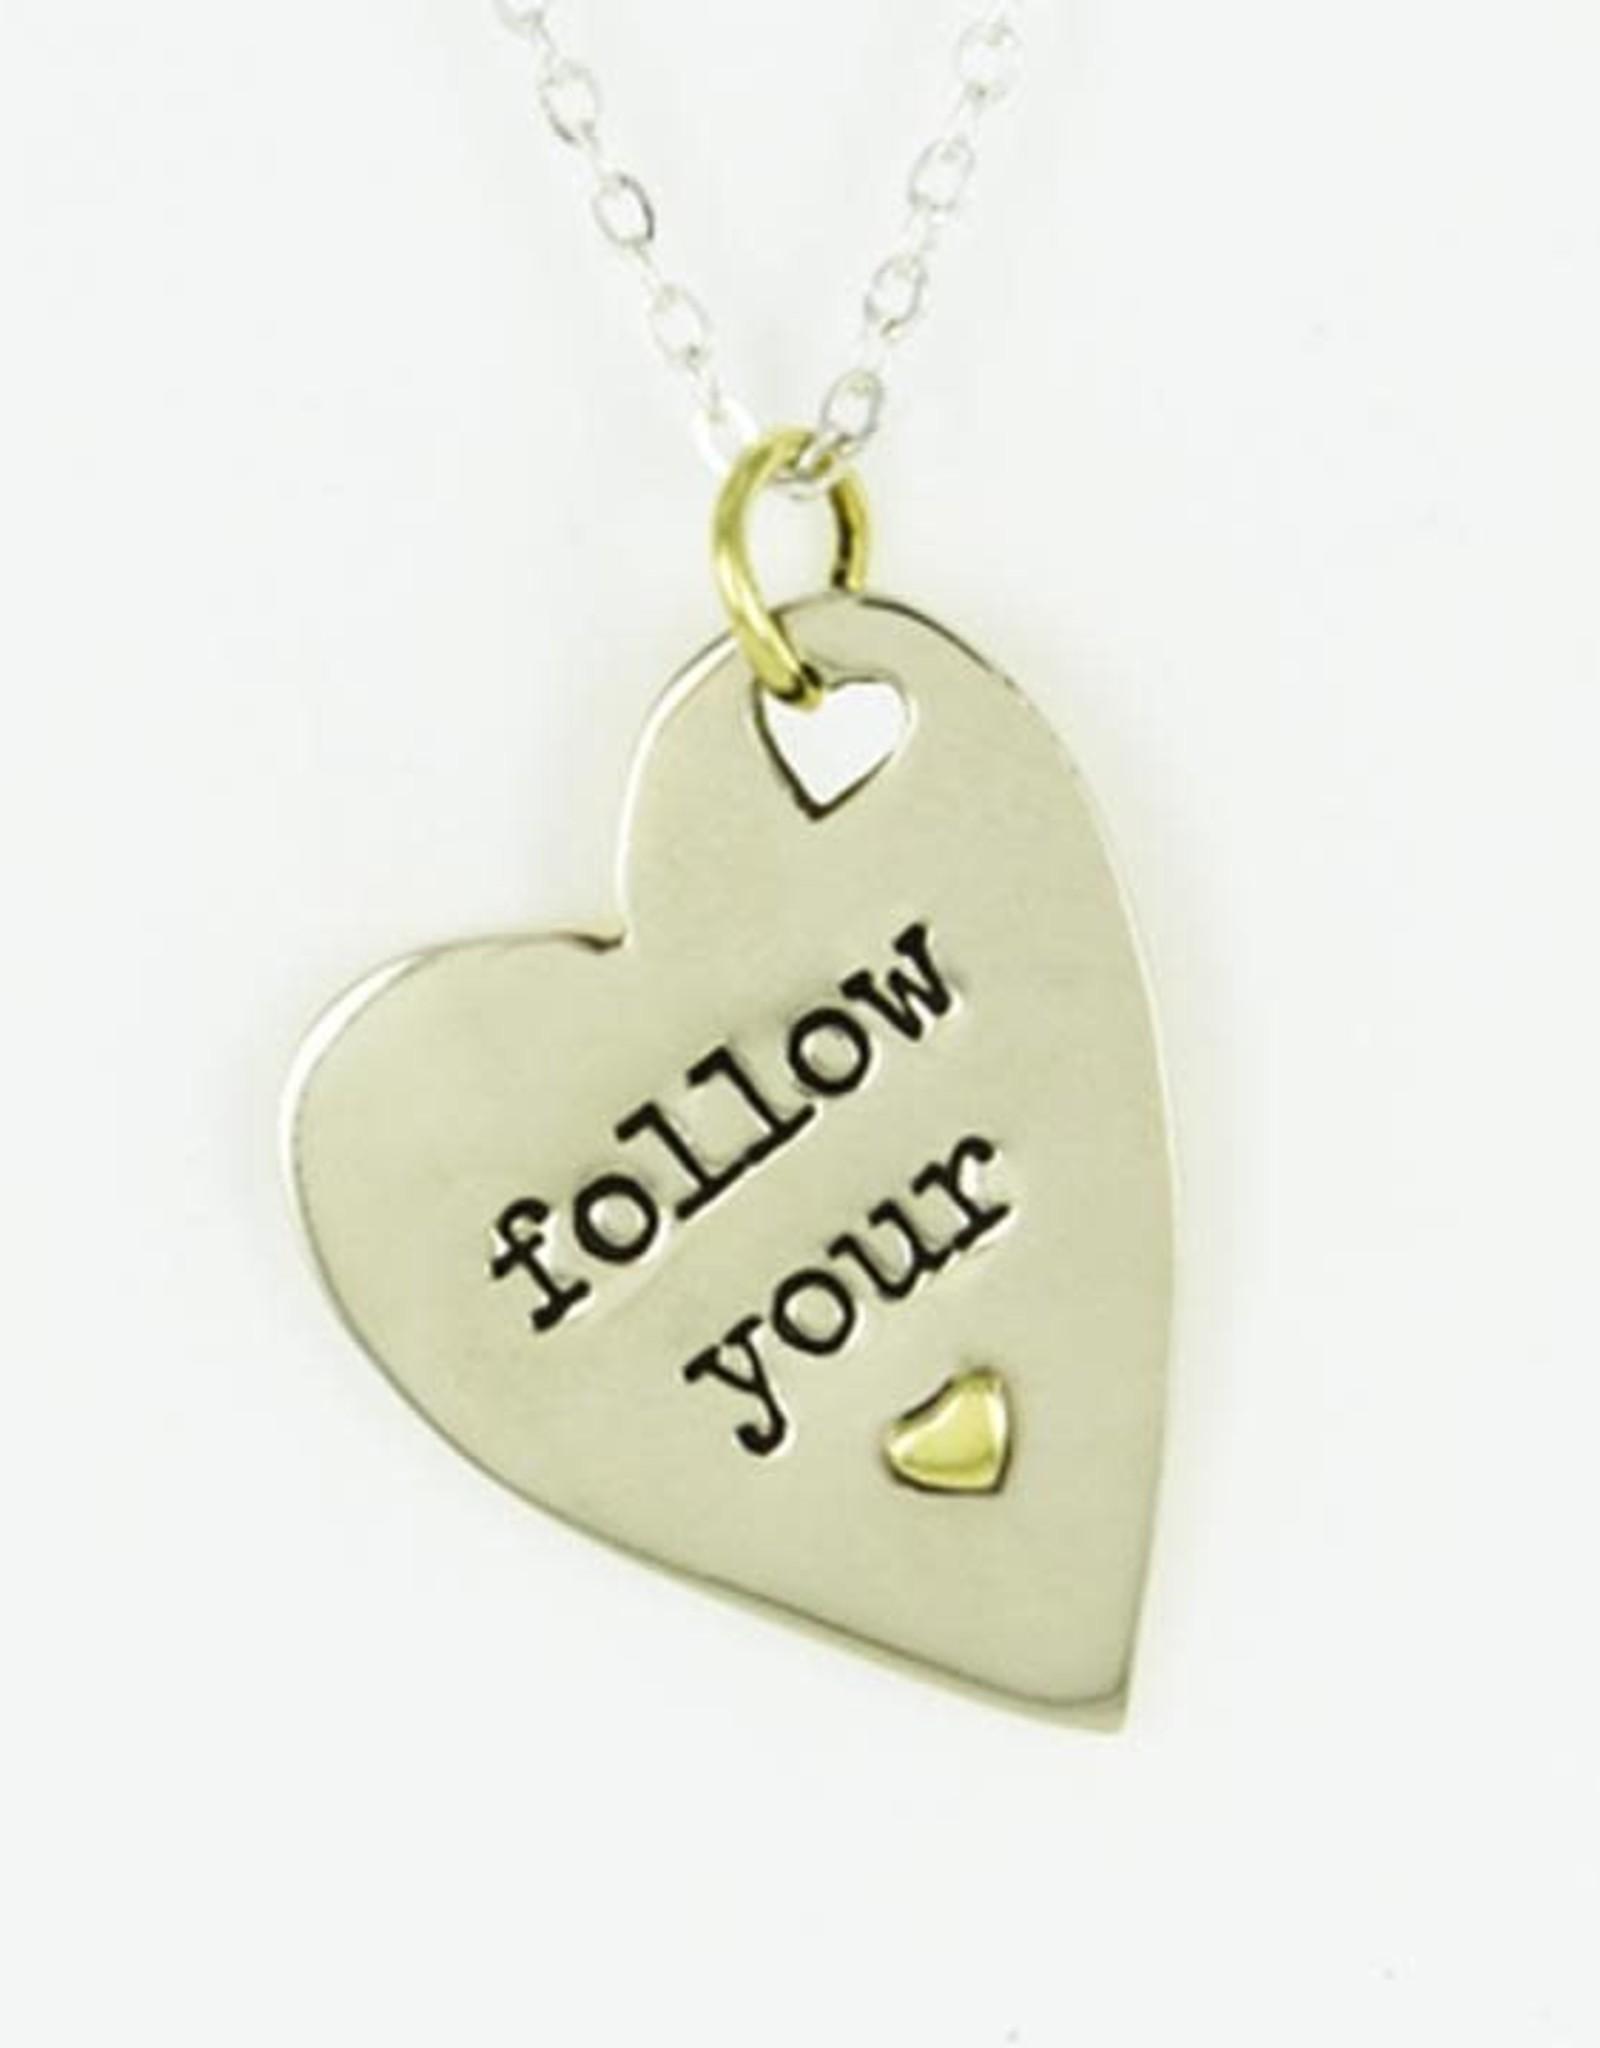 Pendant Necklace Follow Your Heart